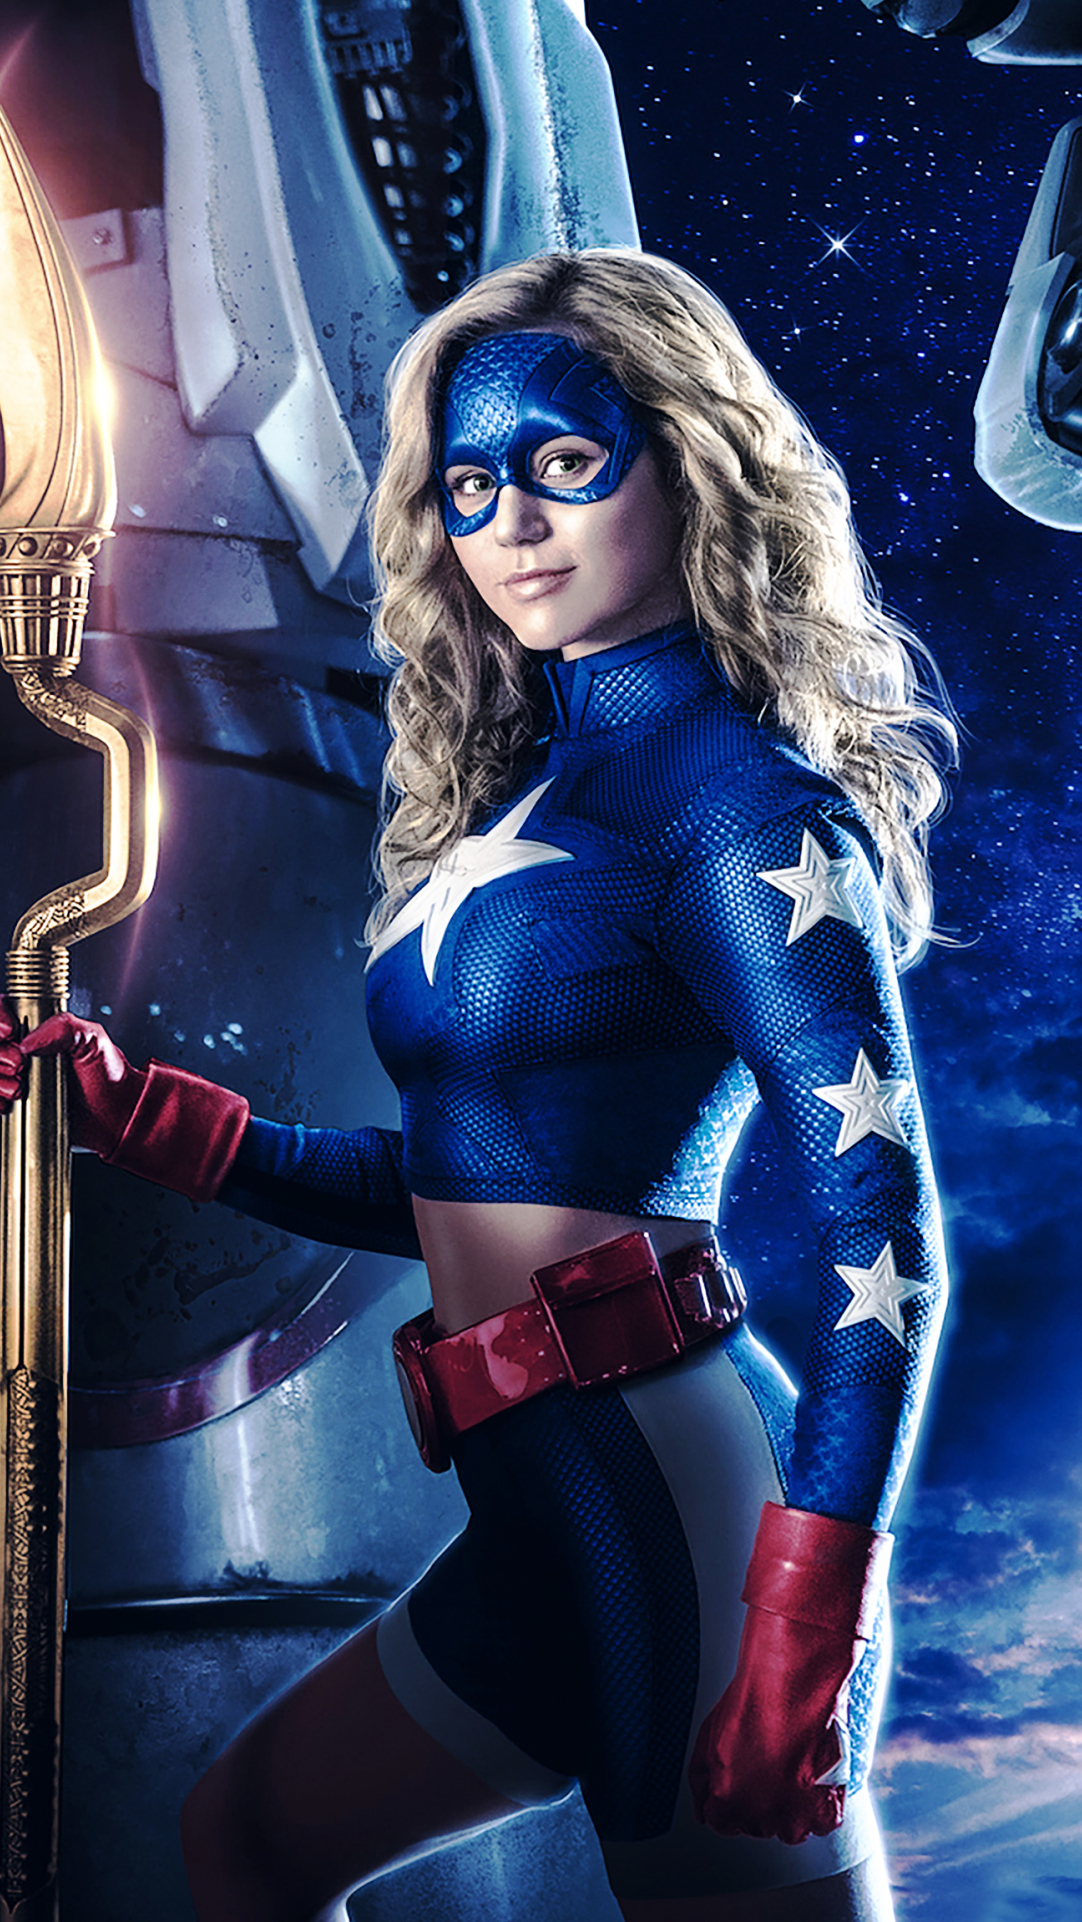 Stargirl DC Universe Wallpaper HD TV Series 4K Wallpapers Images 1082x1922